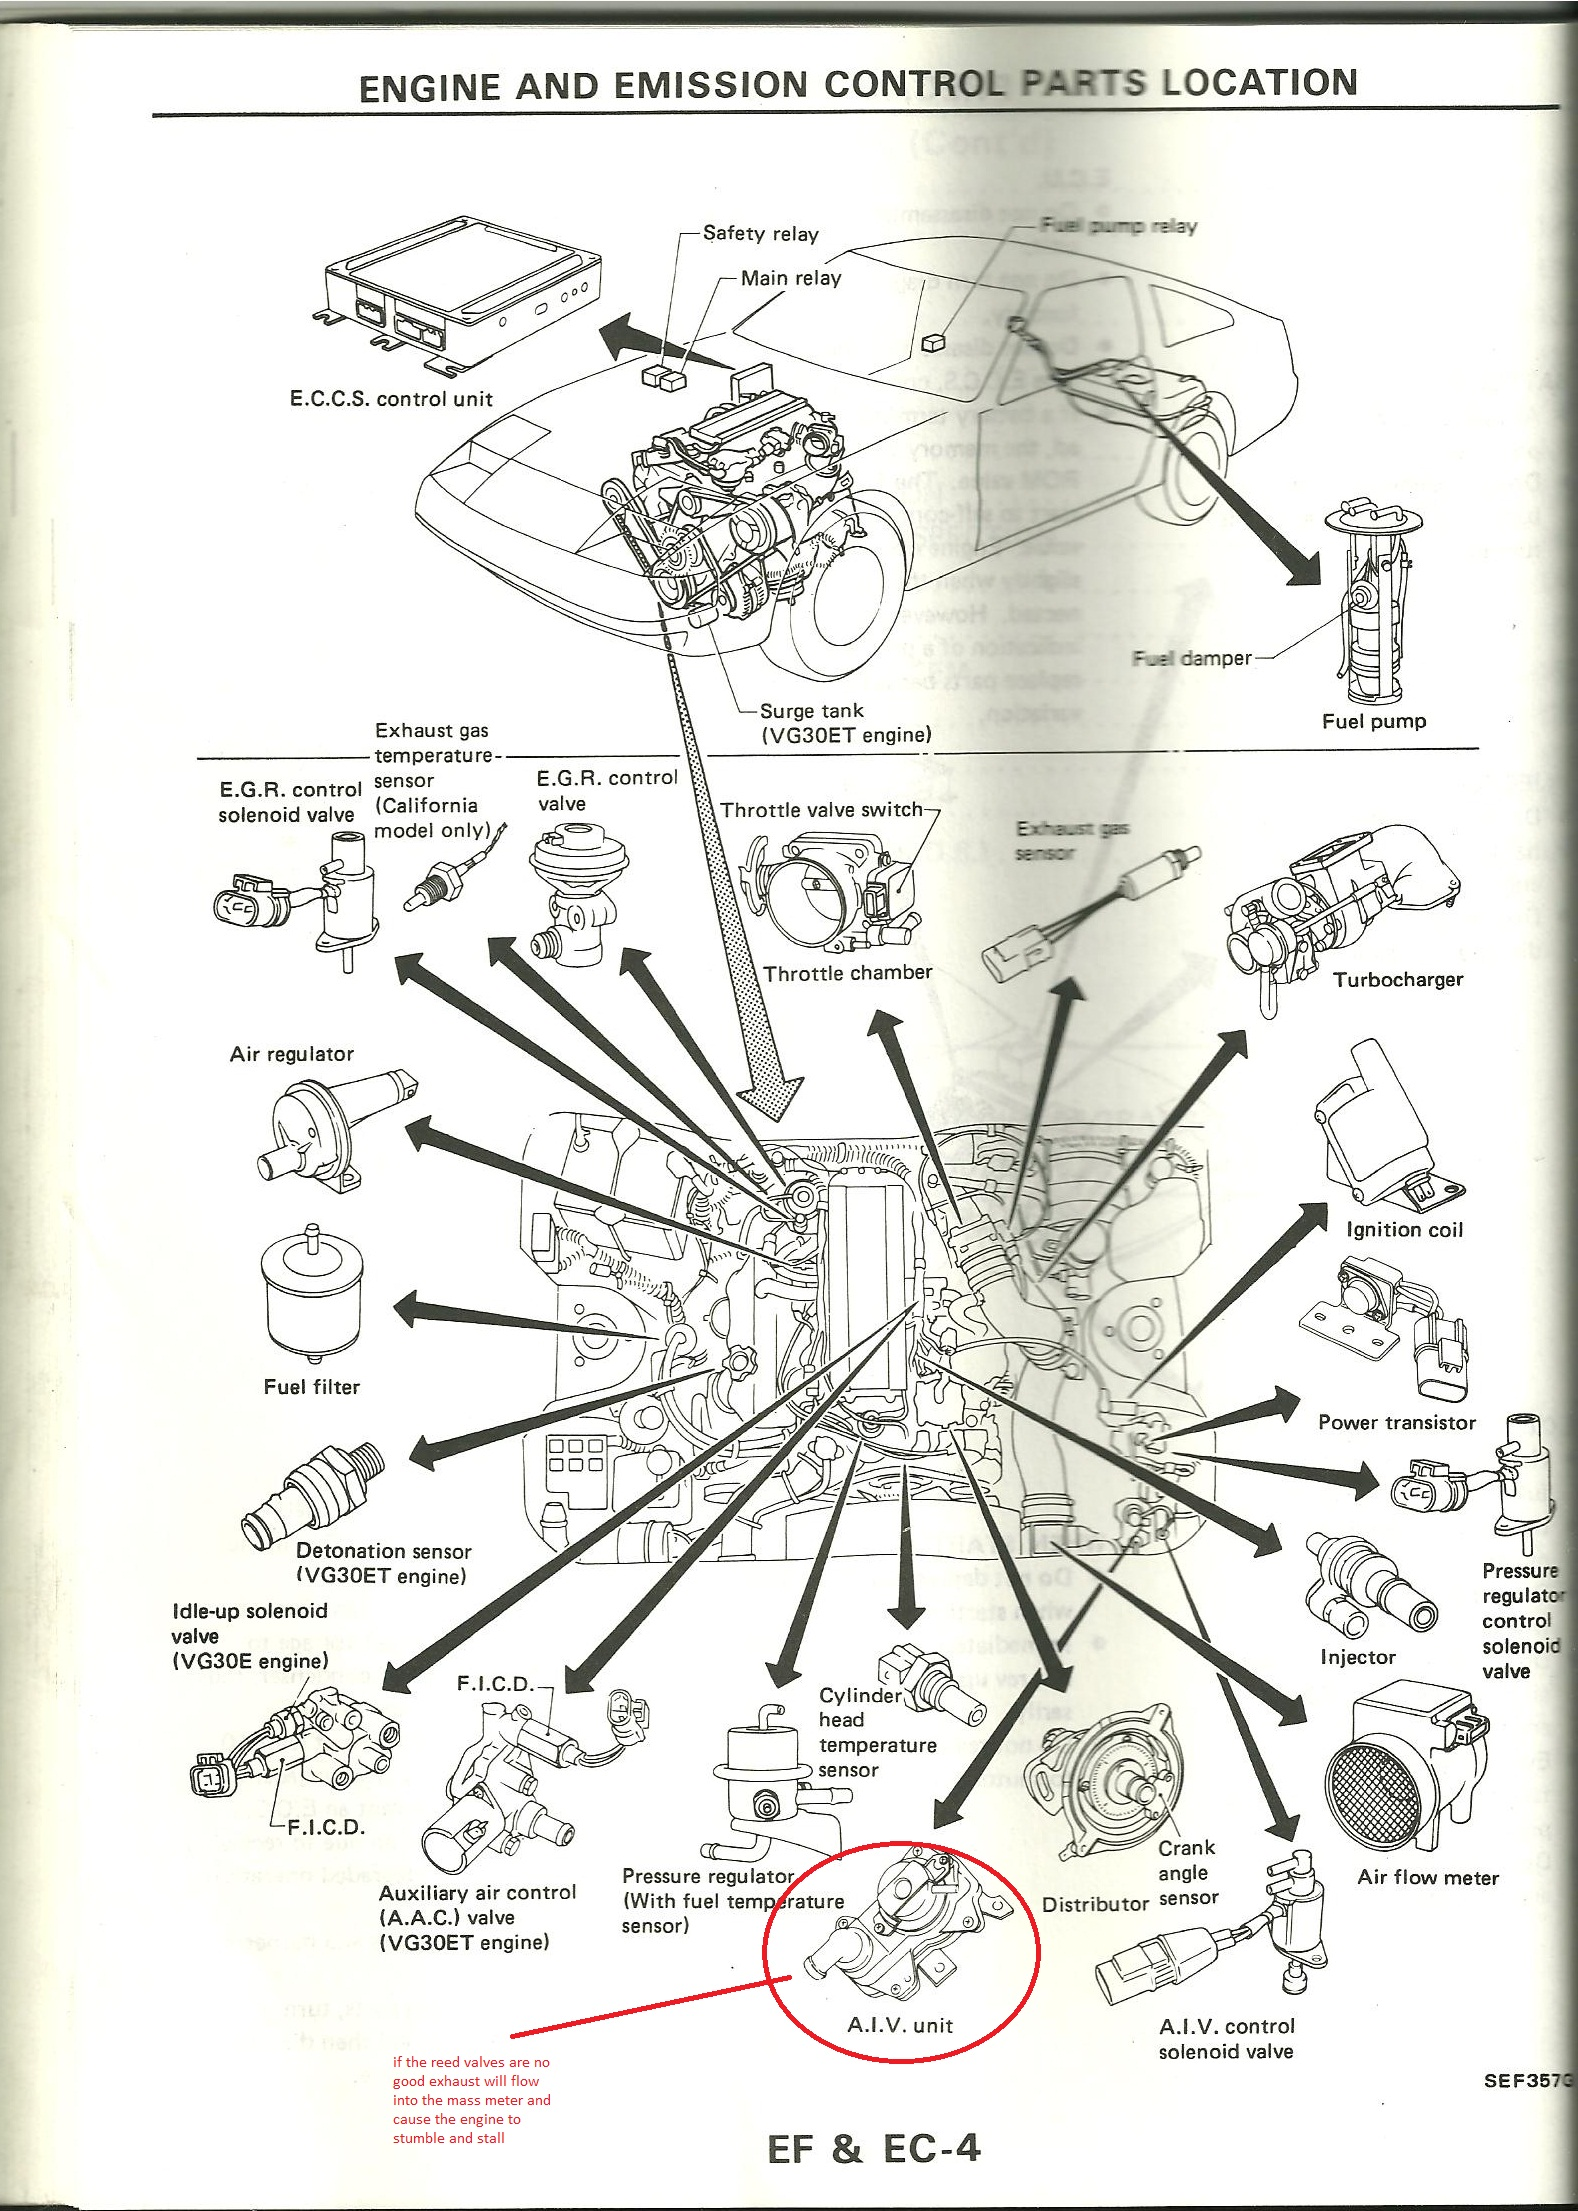 88 nissan z24 vacuum diagram 88 get free image about wiring diagram